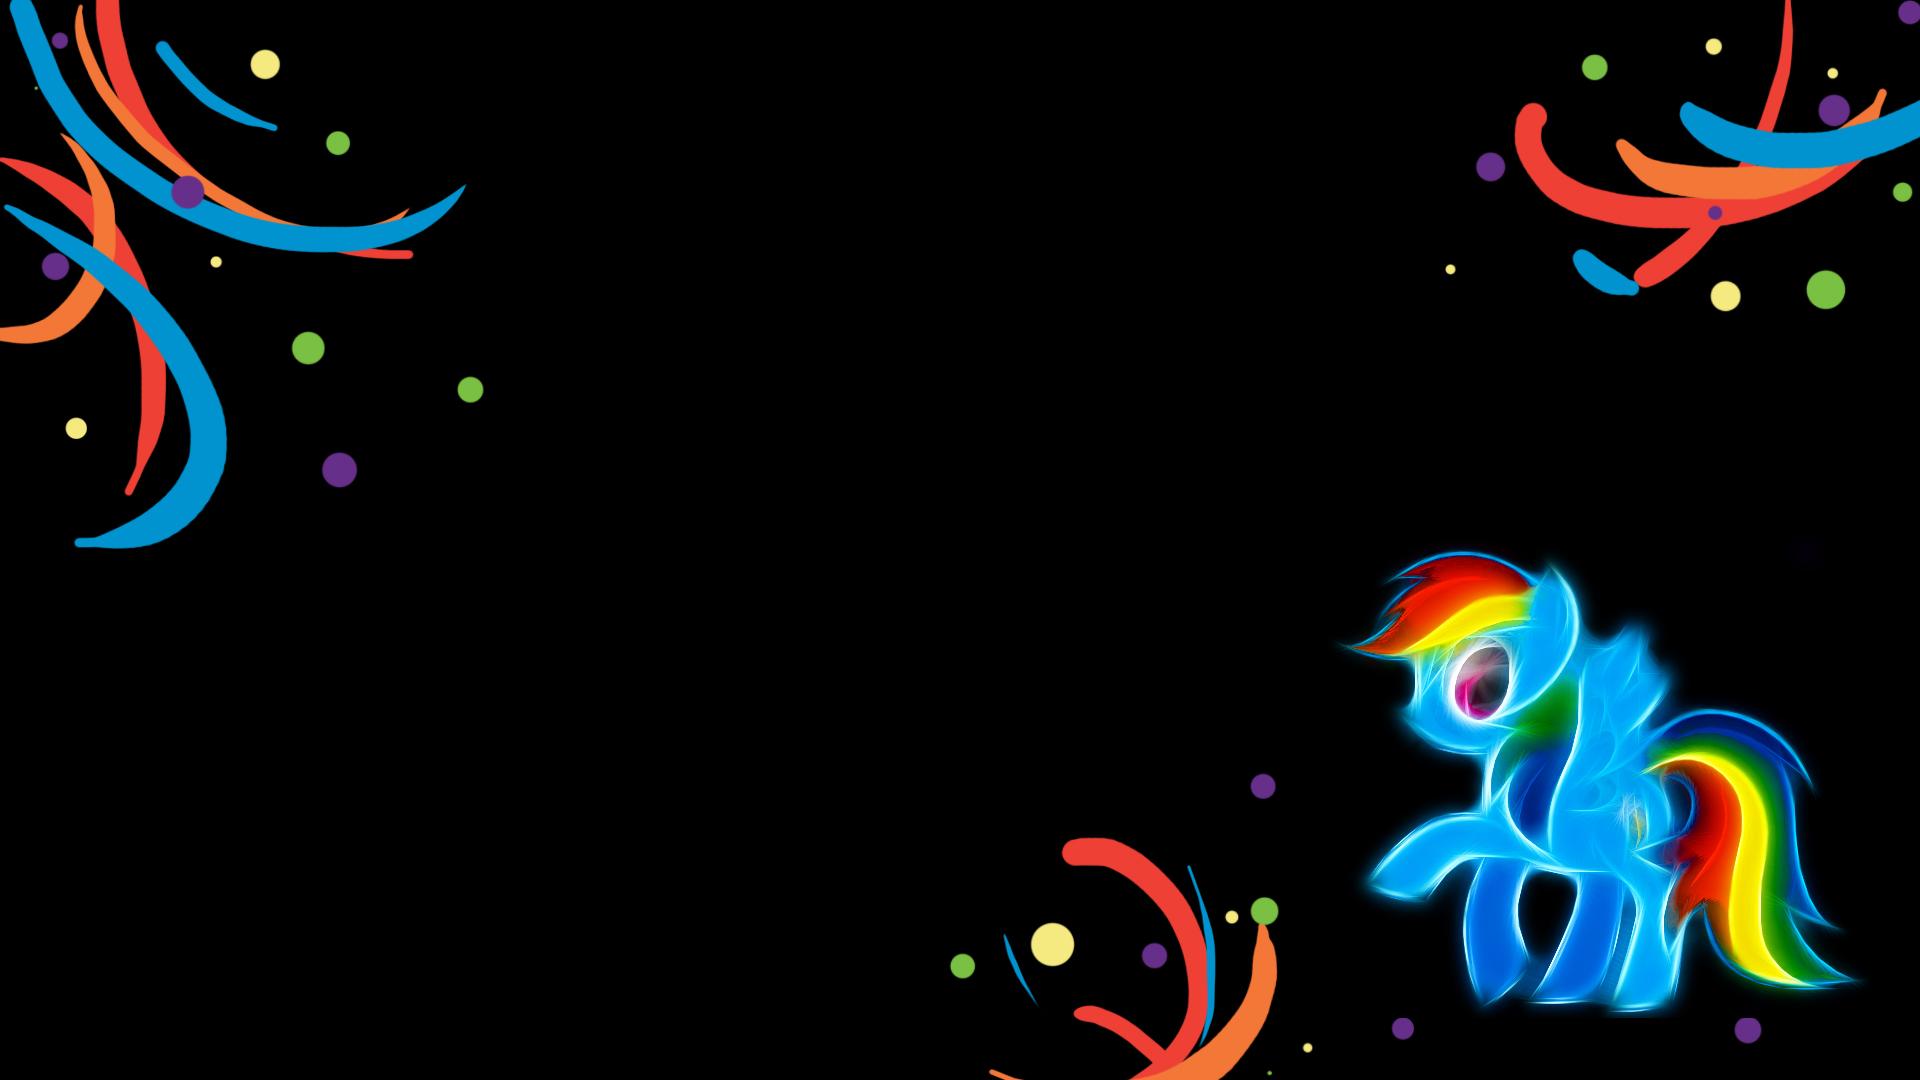 rainbow dash sphere background - photo #2